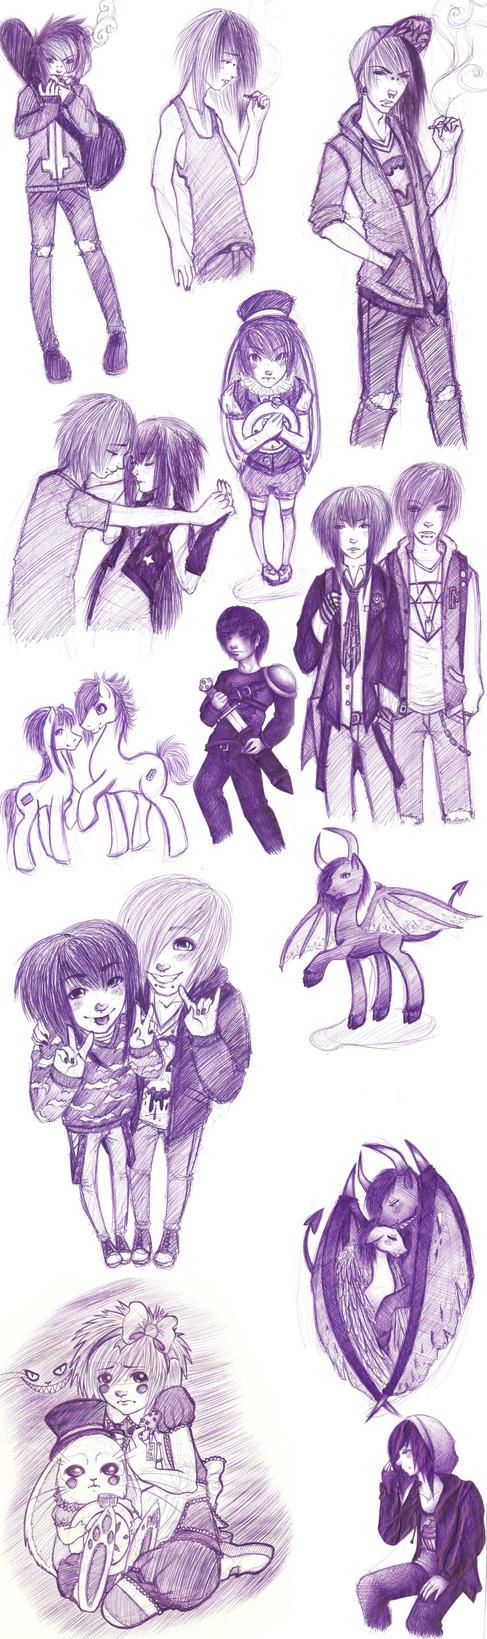 some sketches by SakiHanako